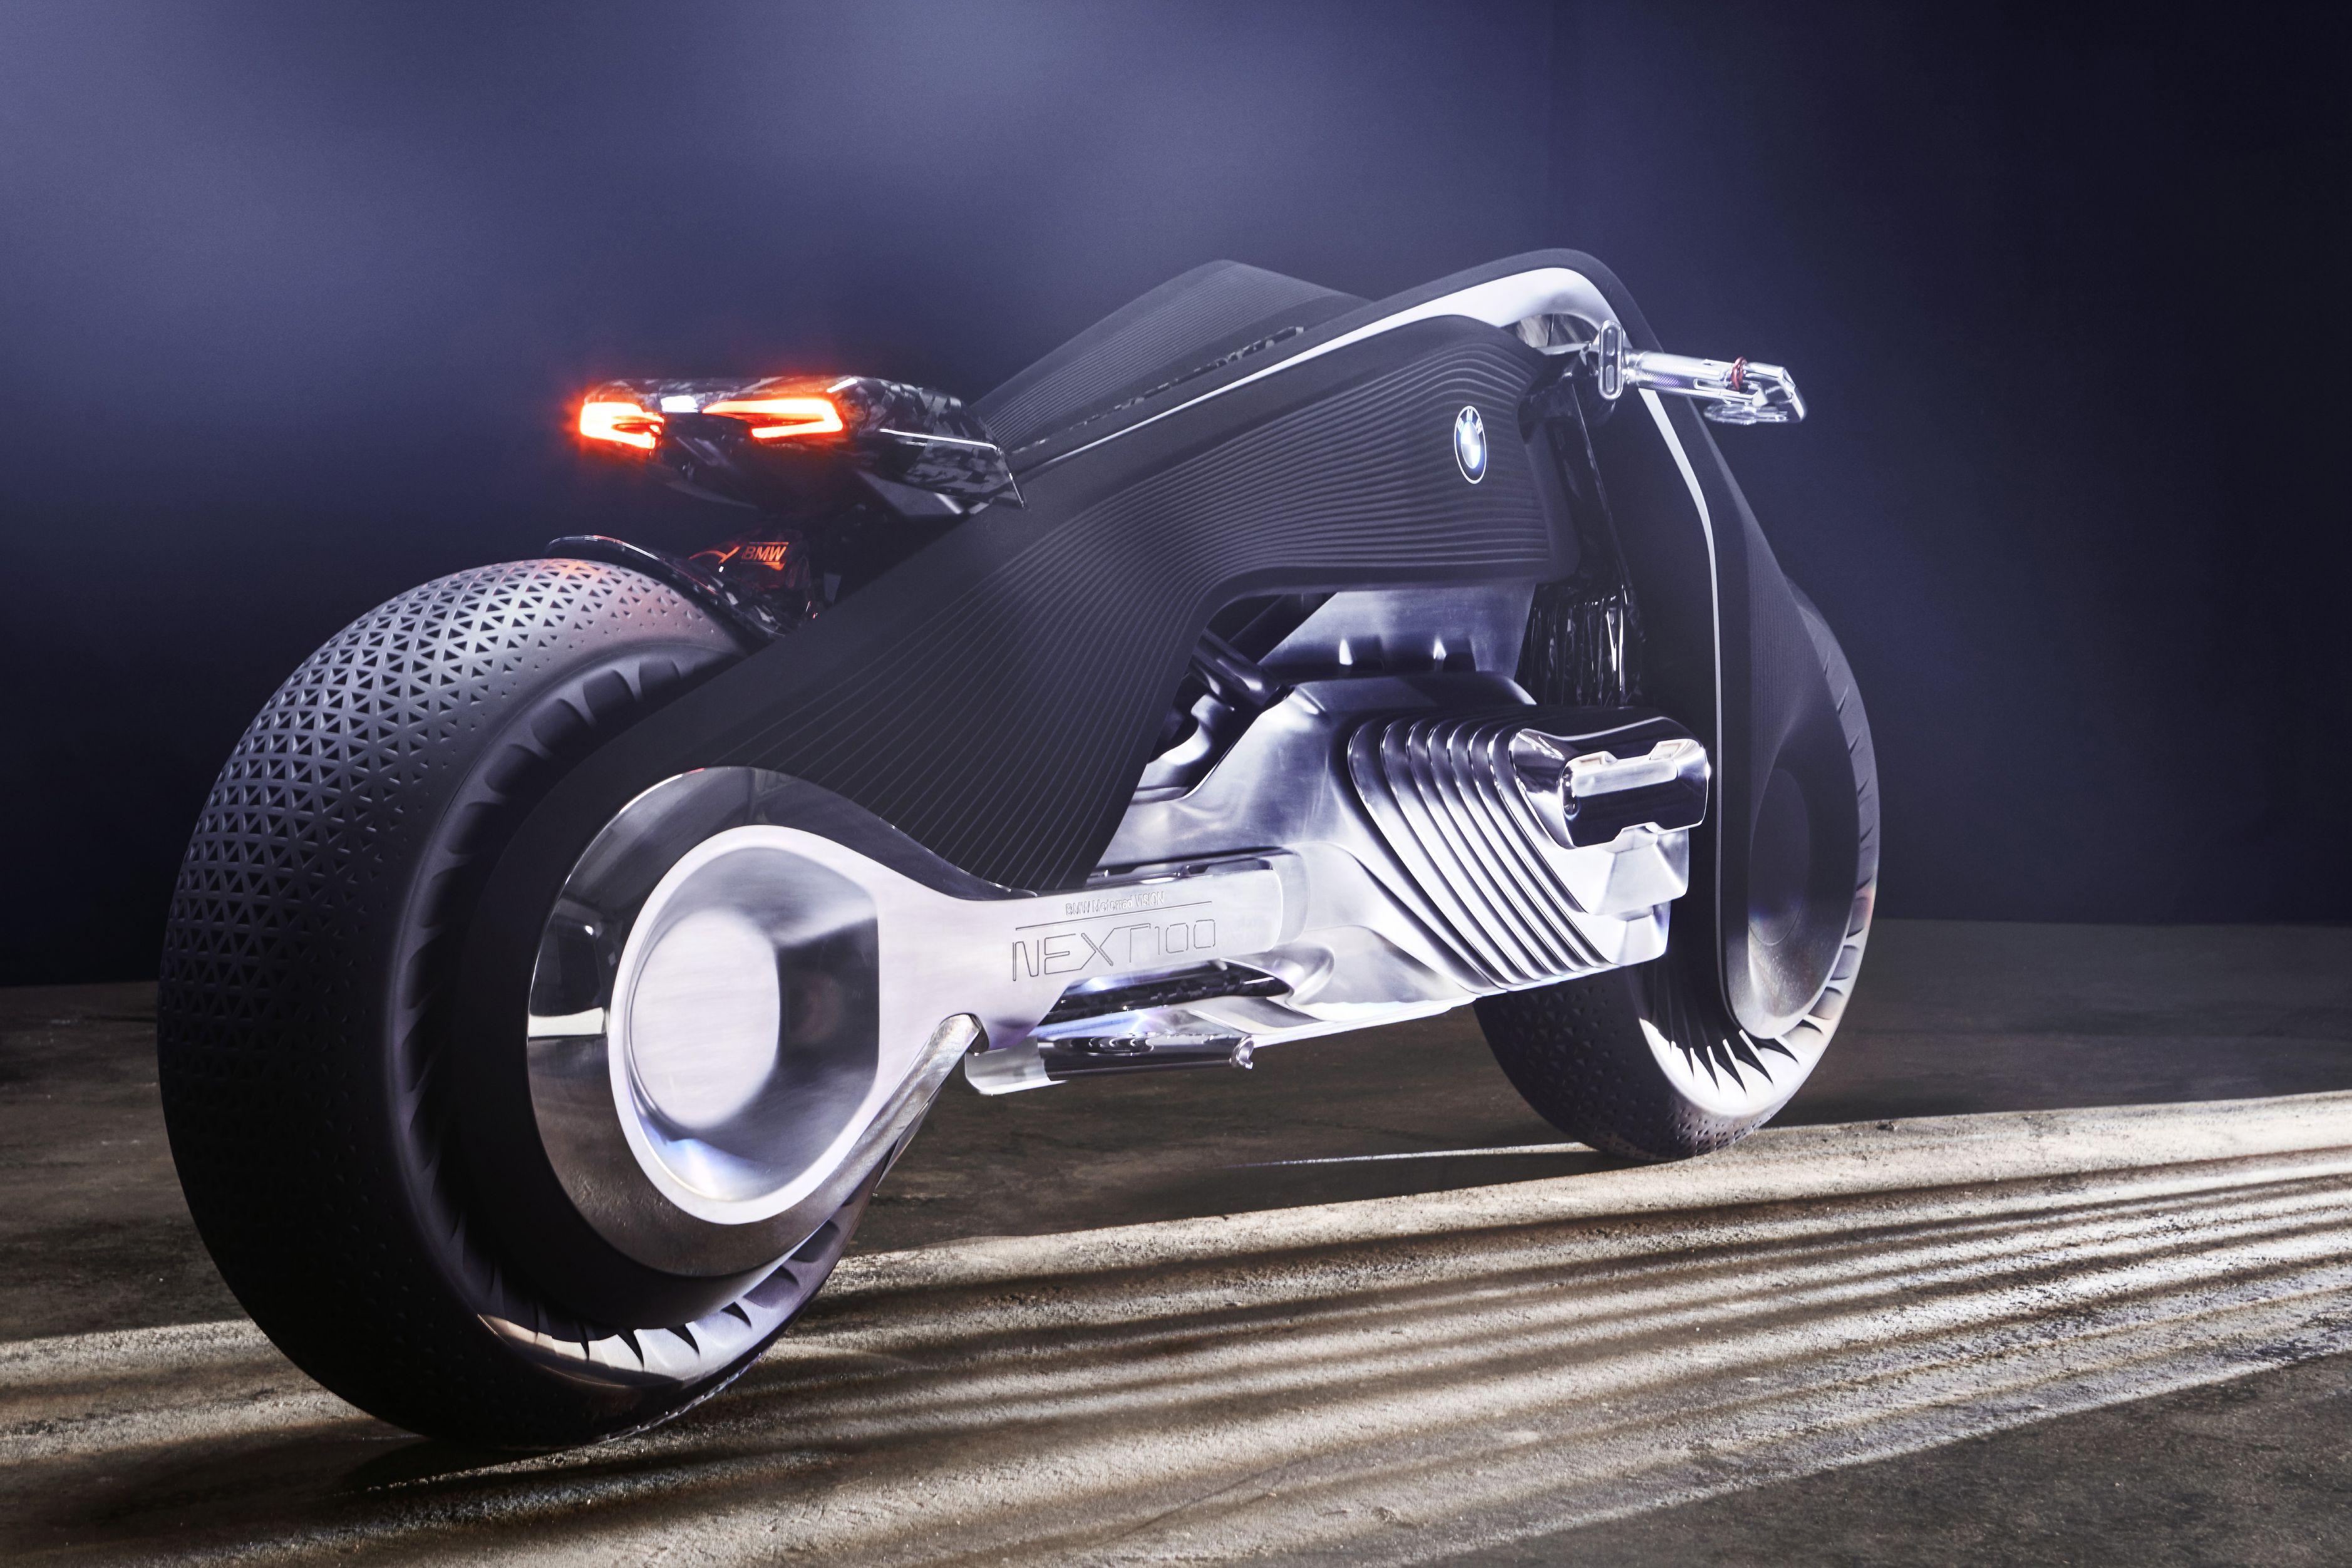 BMW Vision Next 100 concept bike